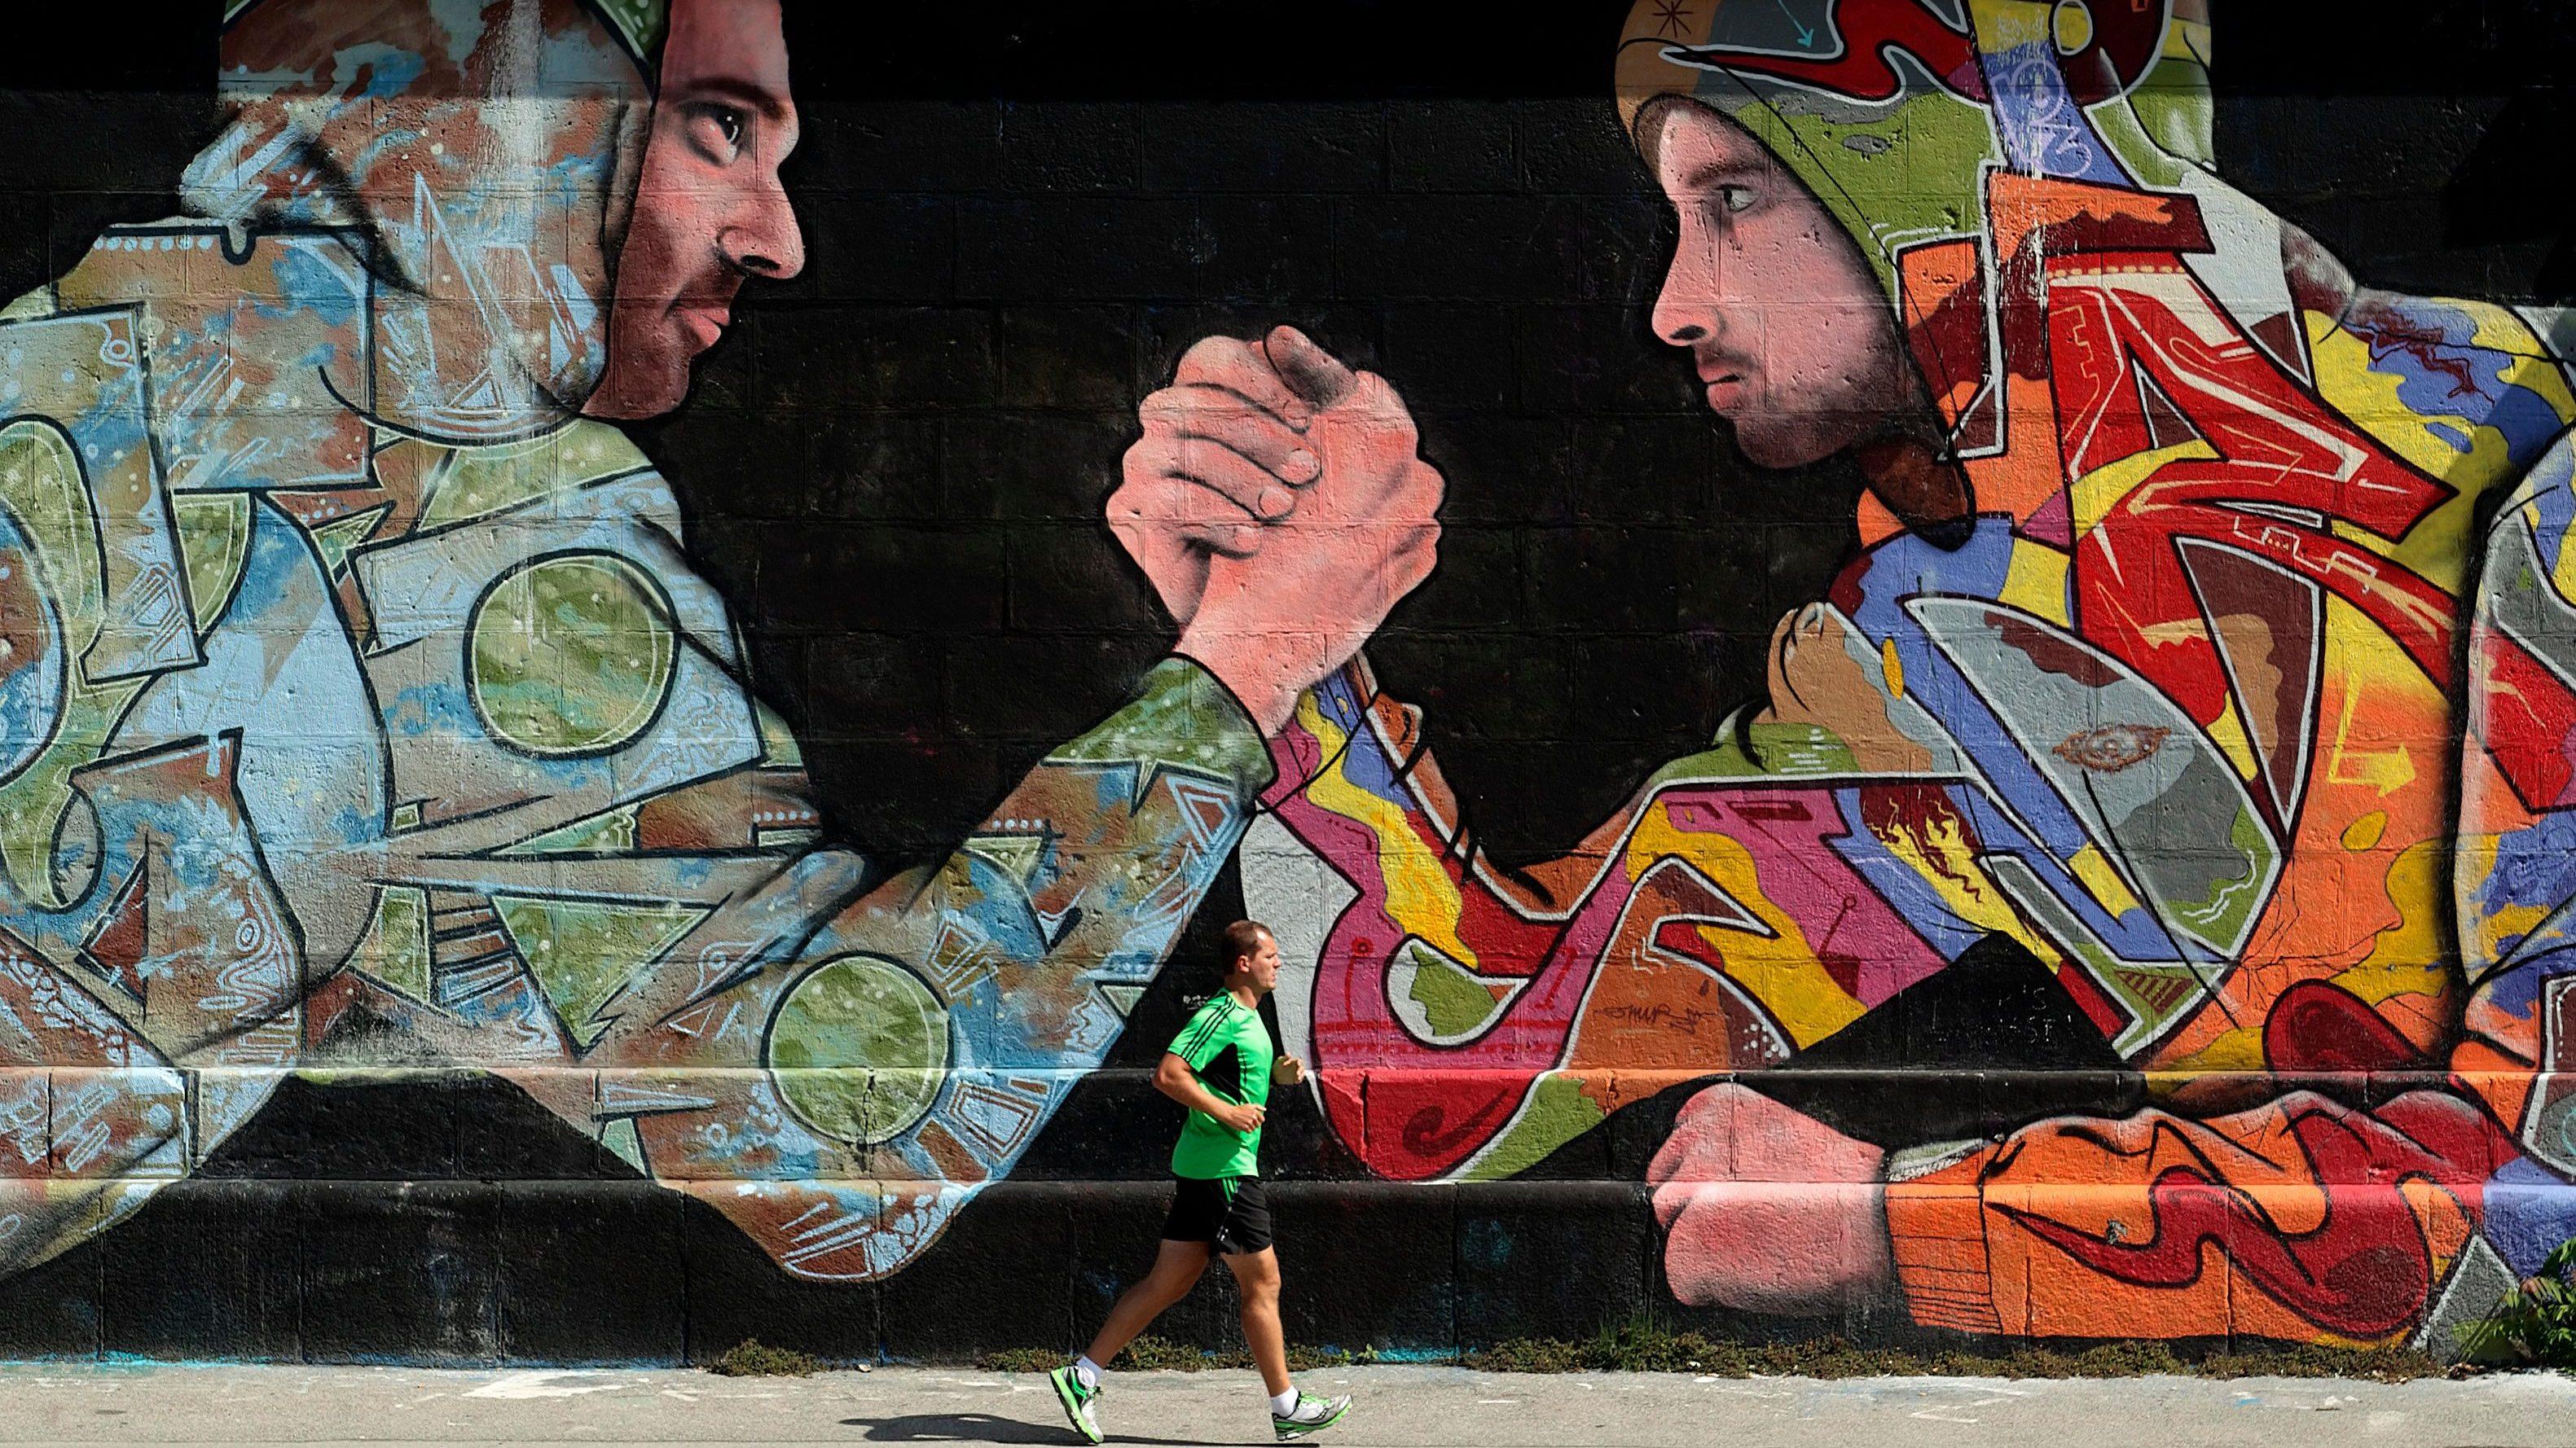 A jogger runs past graffiti on a sunny summer day in Vienna